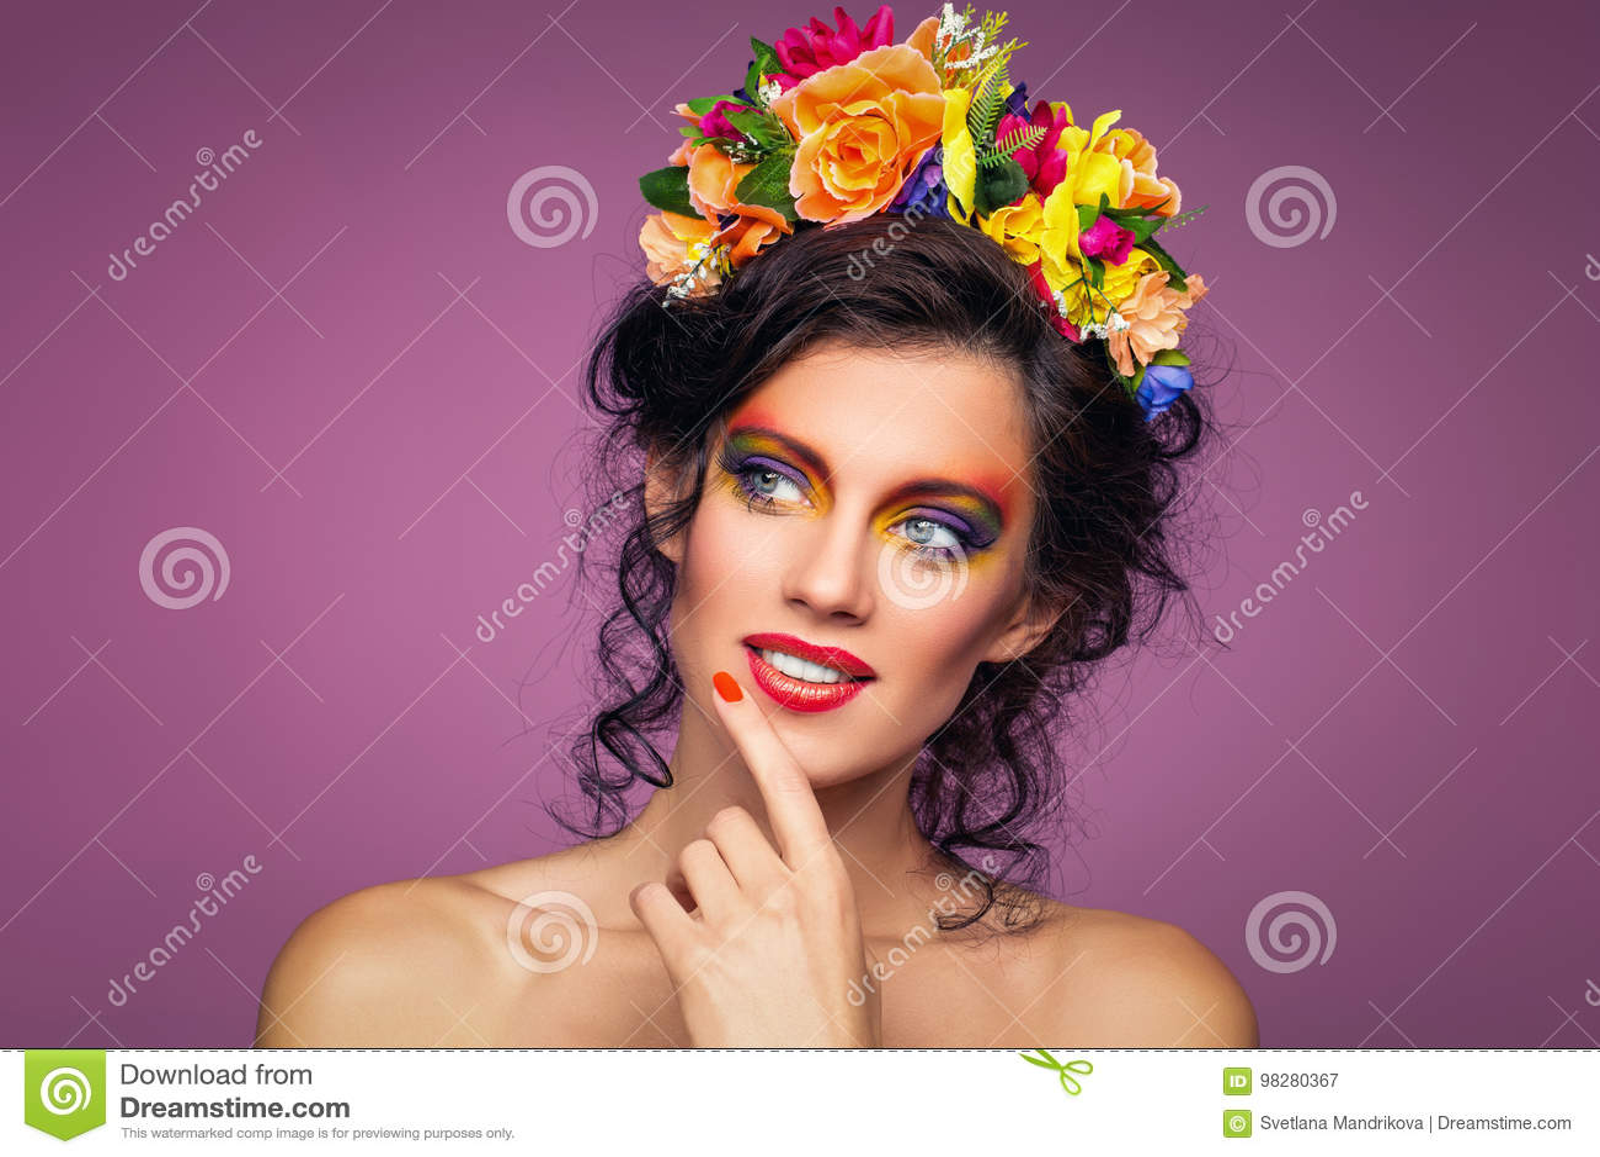 Beautiful girl with flower accessories stock image image of download beautiful girl with flower accessories stock image image of beautiful fashion 98280367 izmirmasajfo